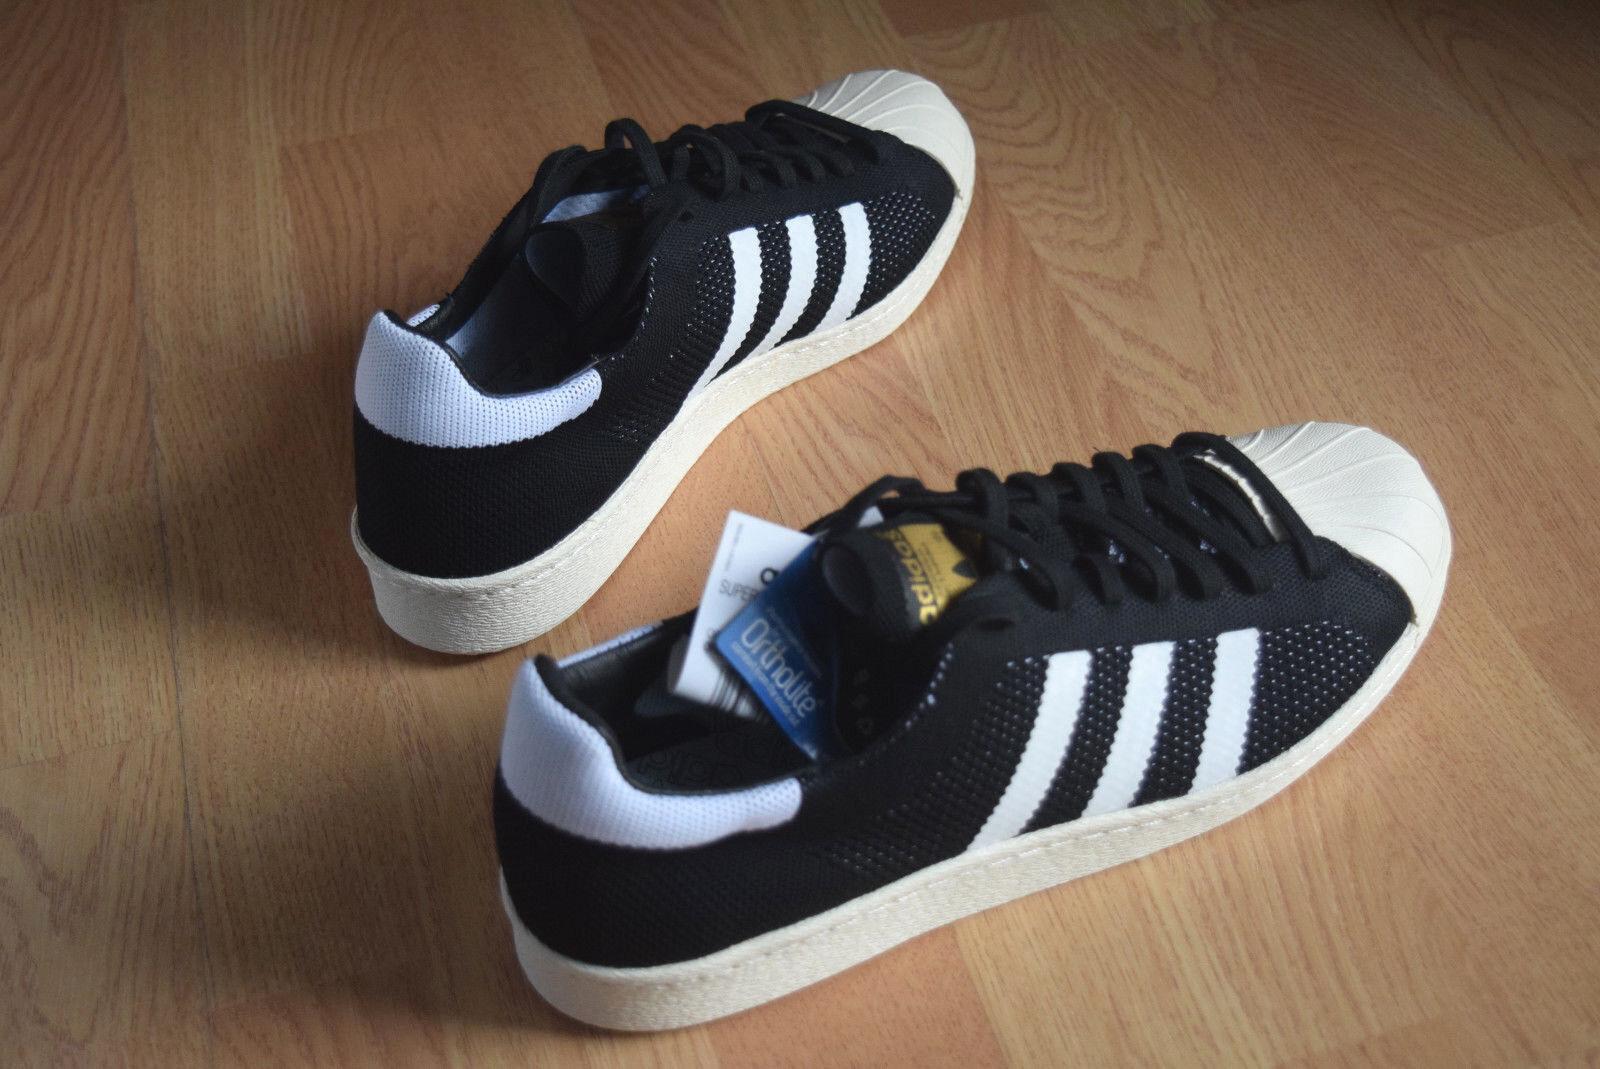 Adidas Superstar 80's gazelle PK 44,5  suPeRsTaR stan smith gazelle 80's campus S82780 d97cc0